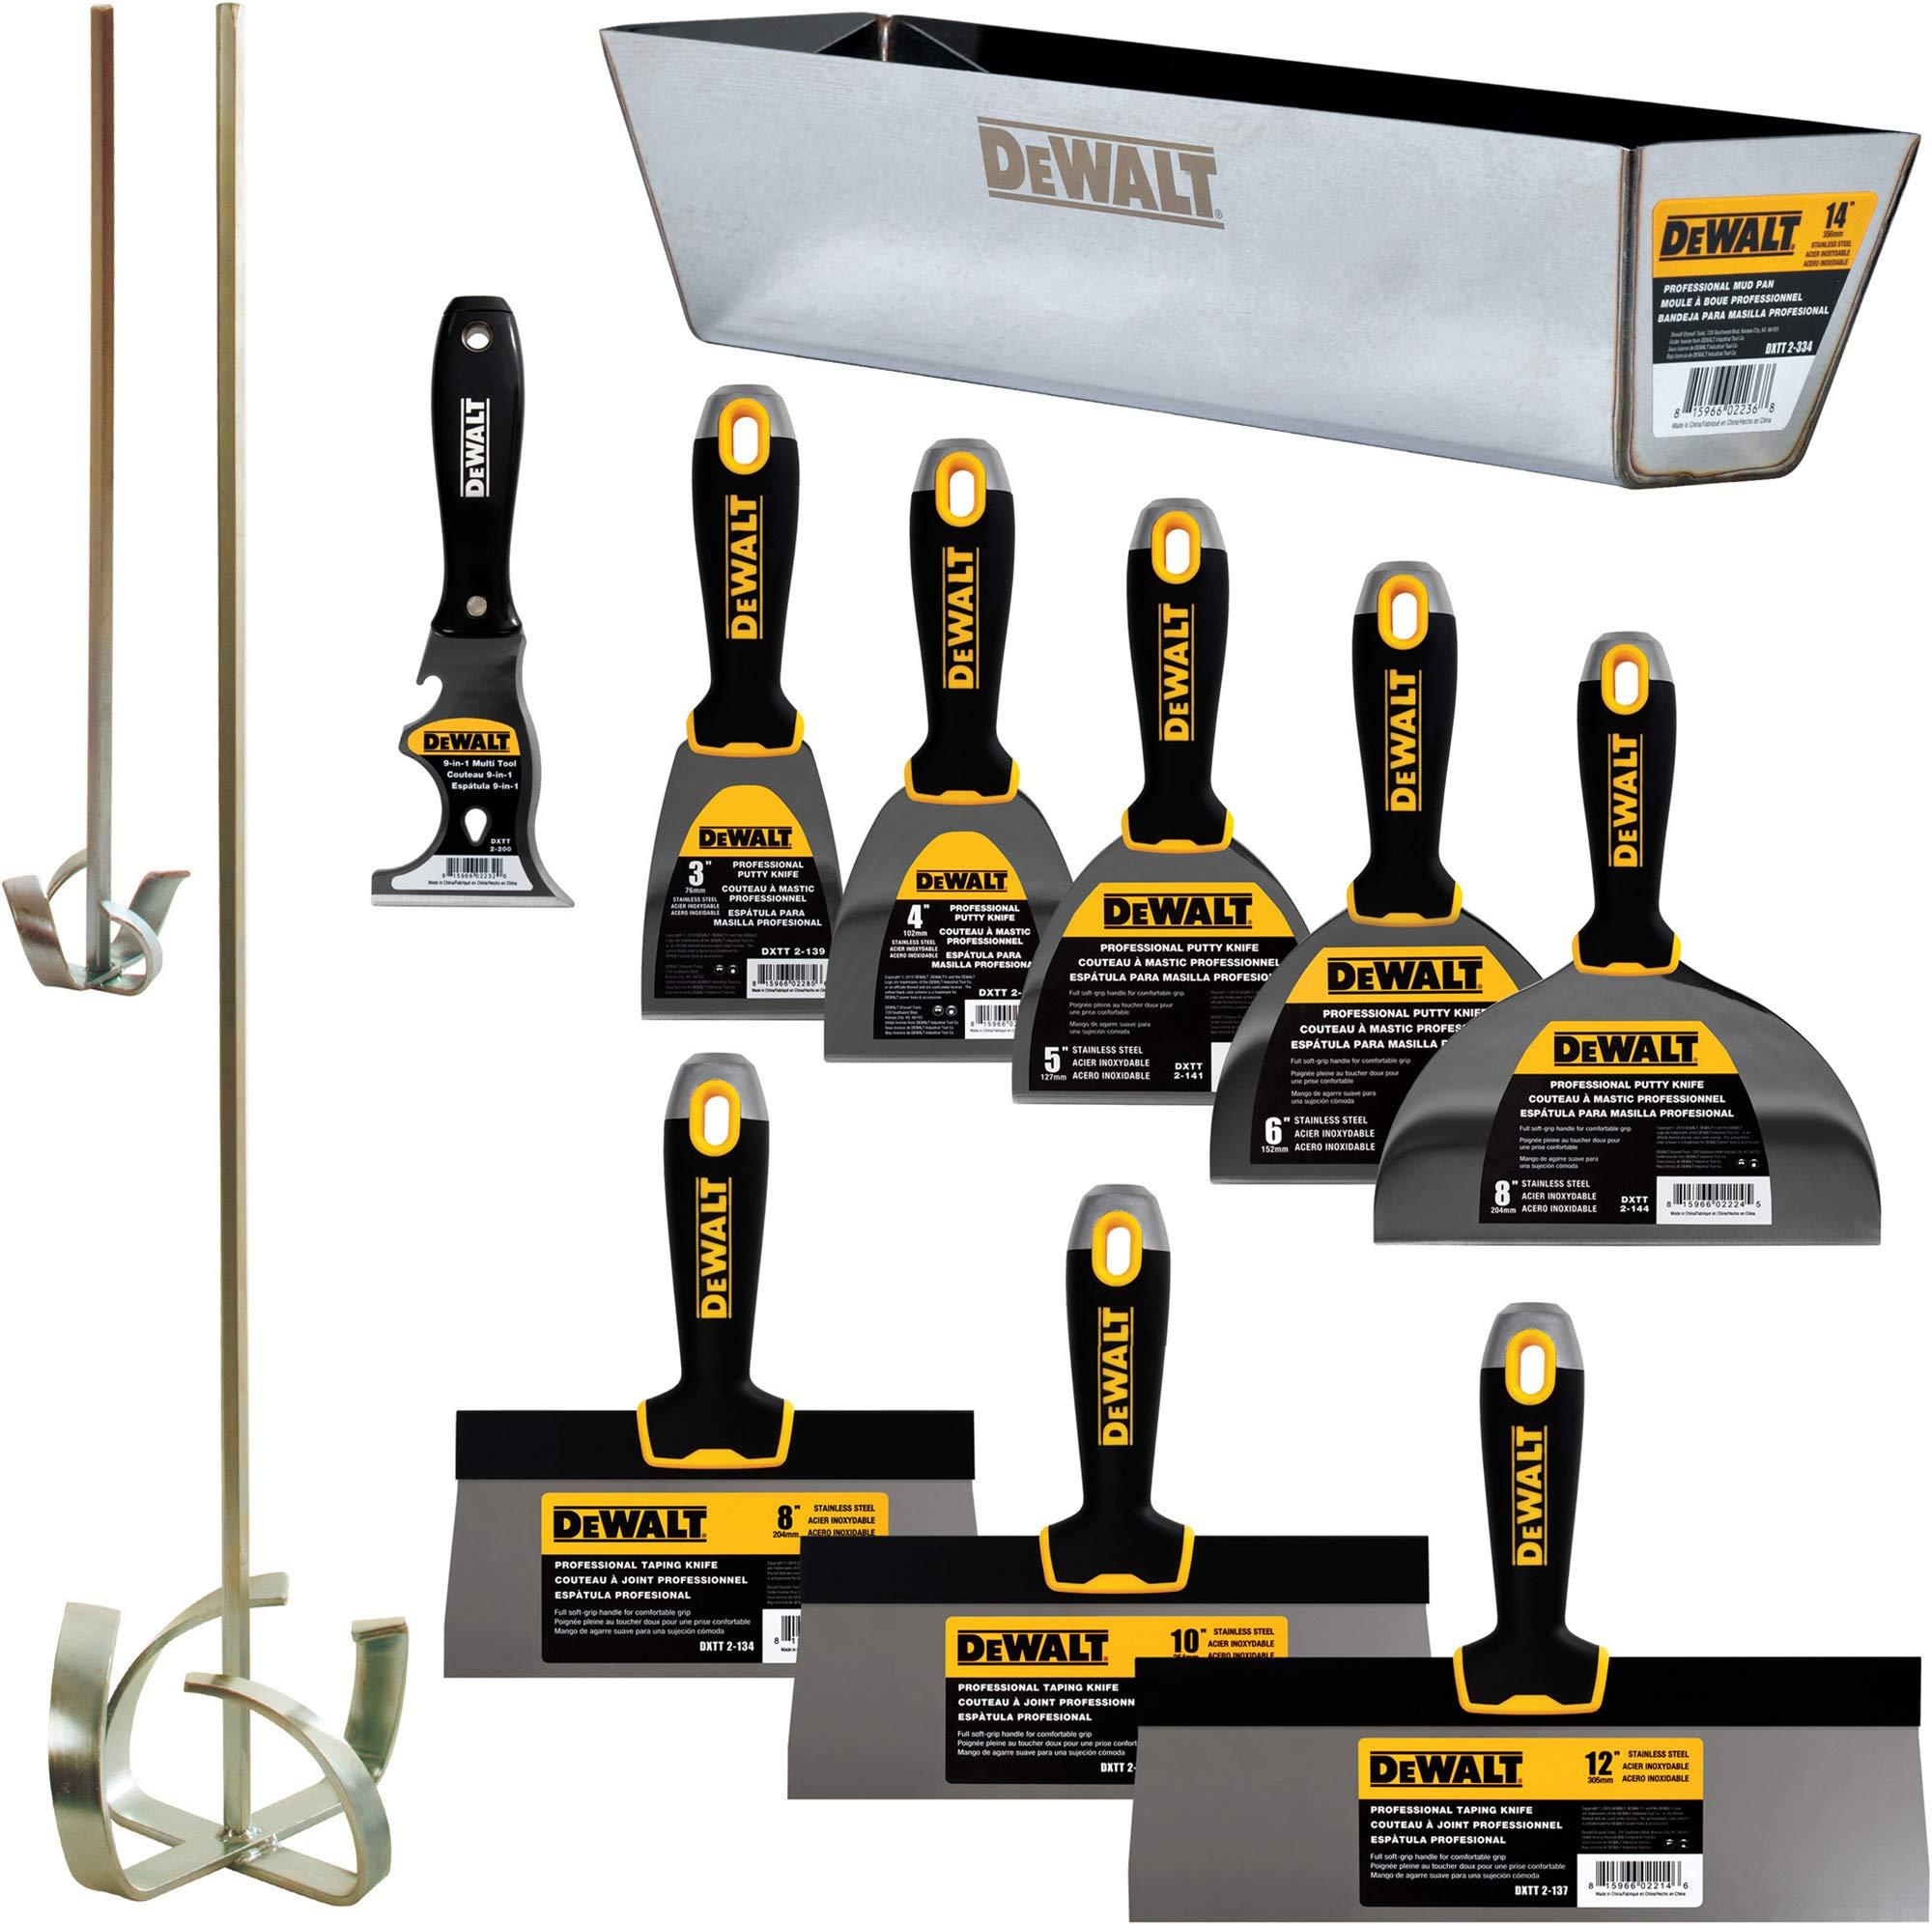 DEWALT DELUXE Stainless Hand Tool Set | 8/10/12'' Taping Knives, 3/4/5/6/8'' Putty Knives, 2 Mud Mixers, 9-in-1 Painter's Multitool + FREE BONUS 14'' Mud Pan | DXTT-3-609 by DEWALT